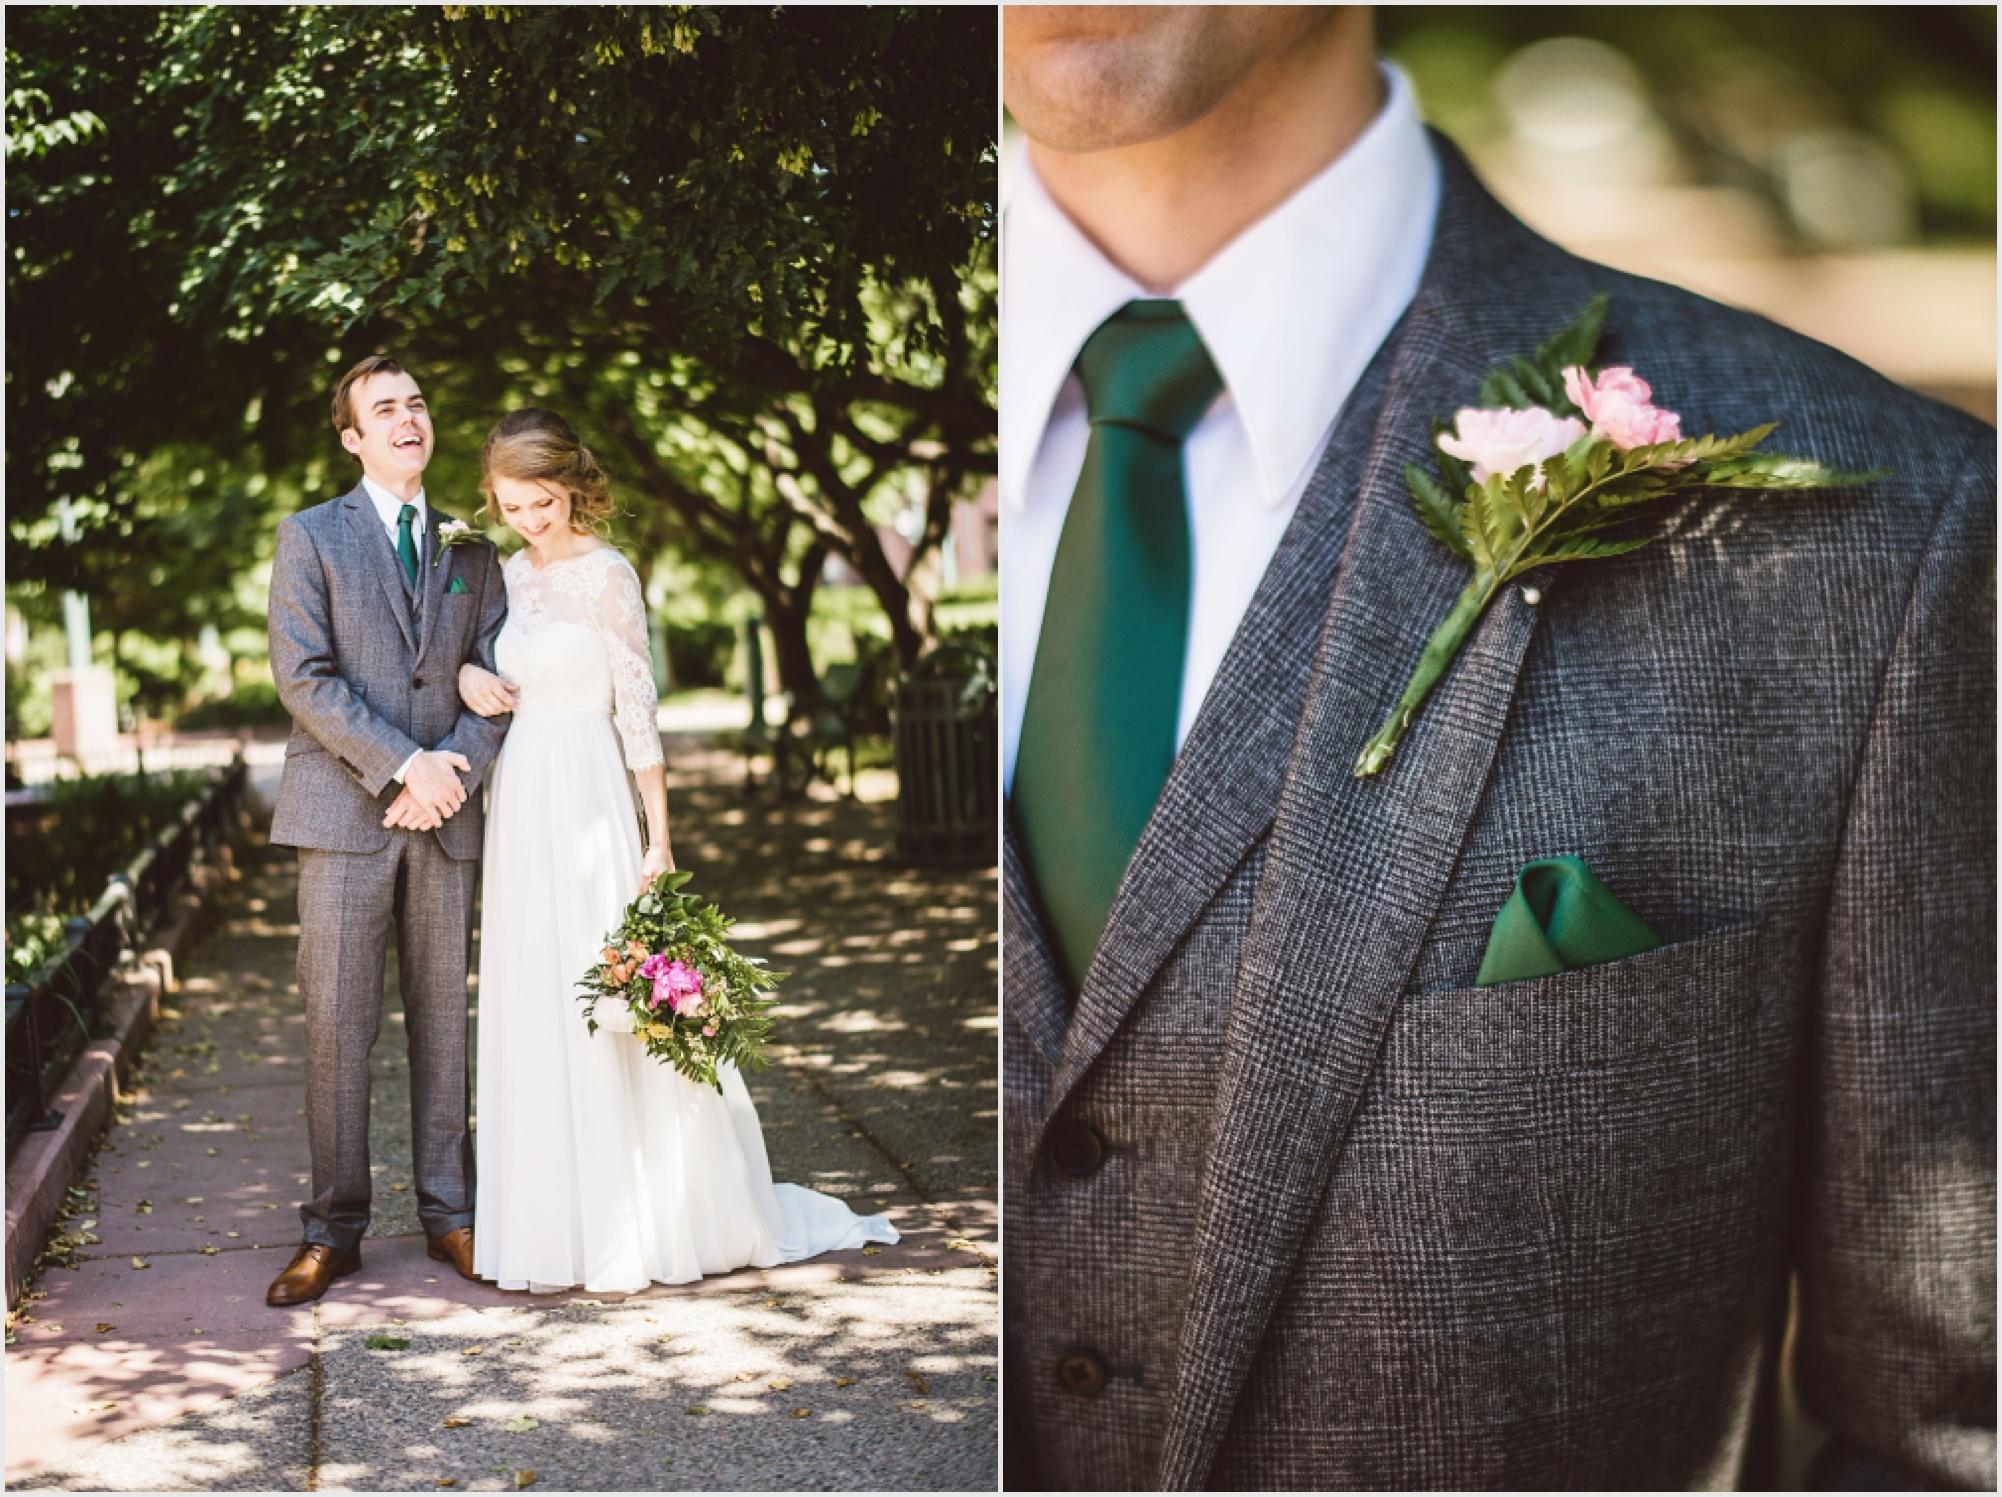 abby_taylor_minneapolis_wedding_lucas_botz_photography_147.jpg